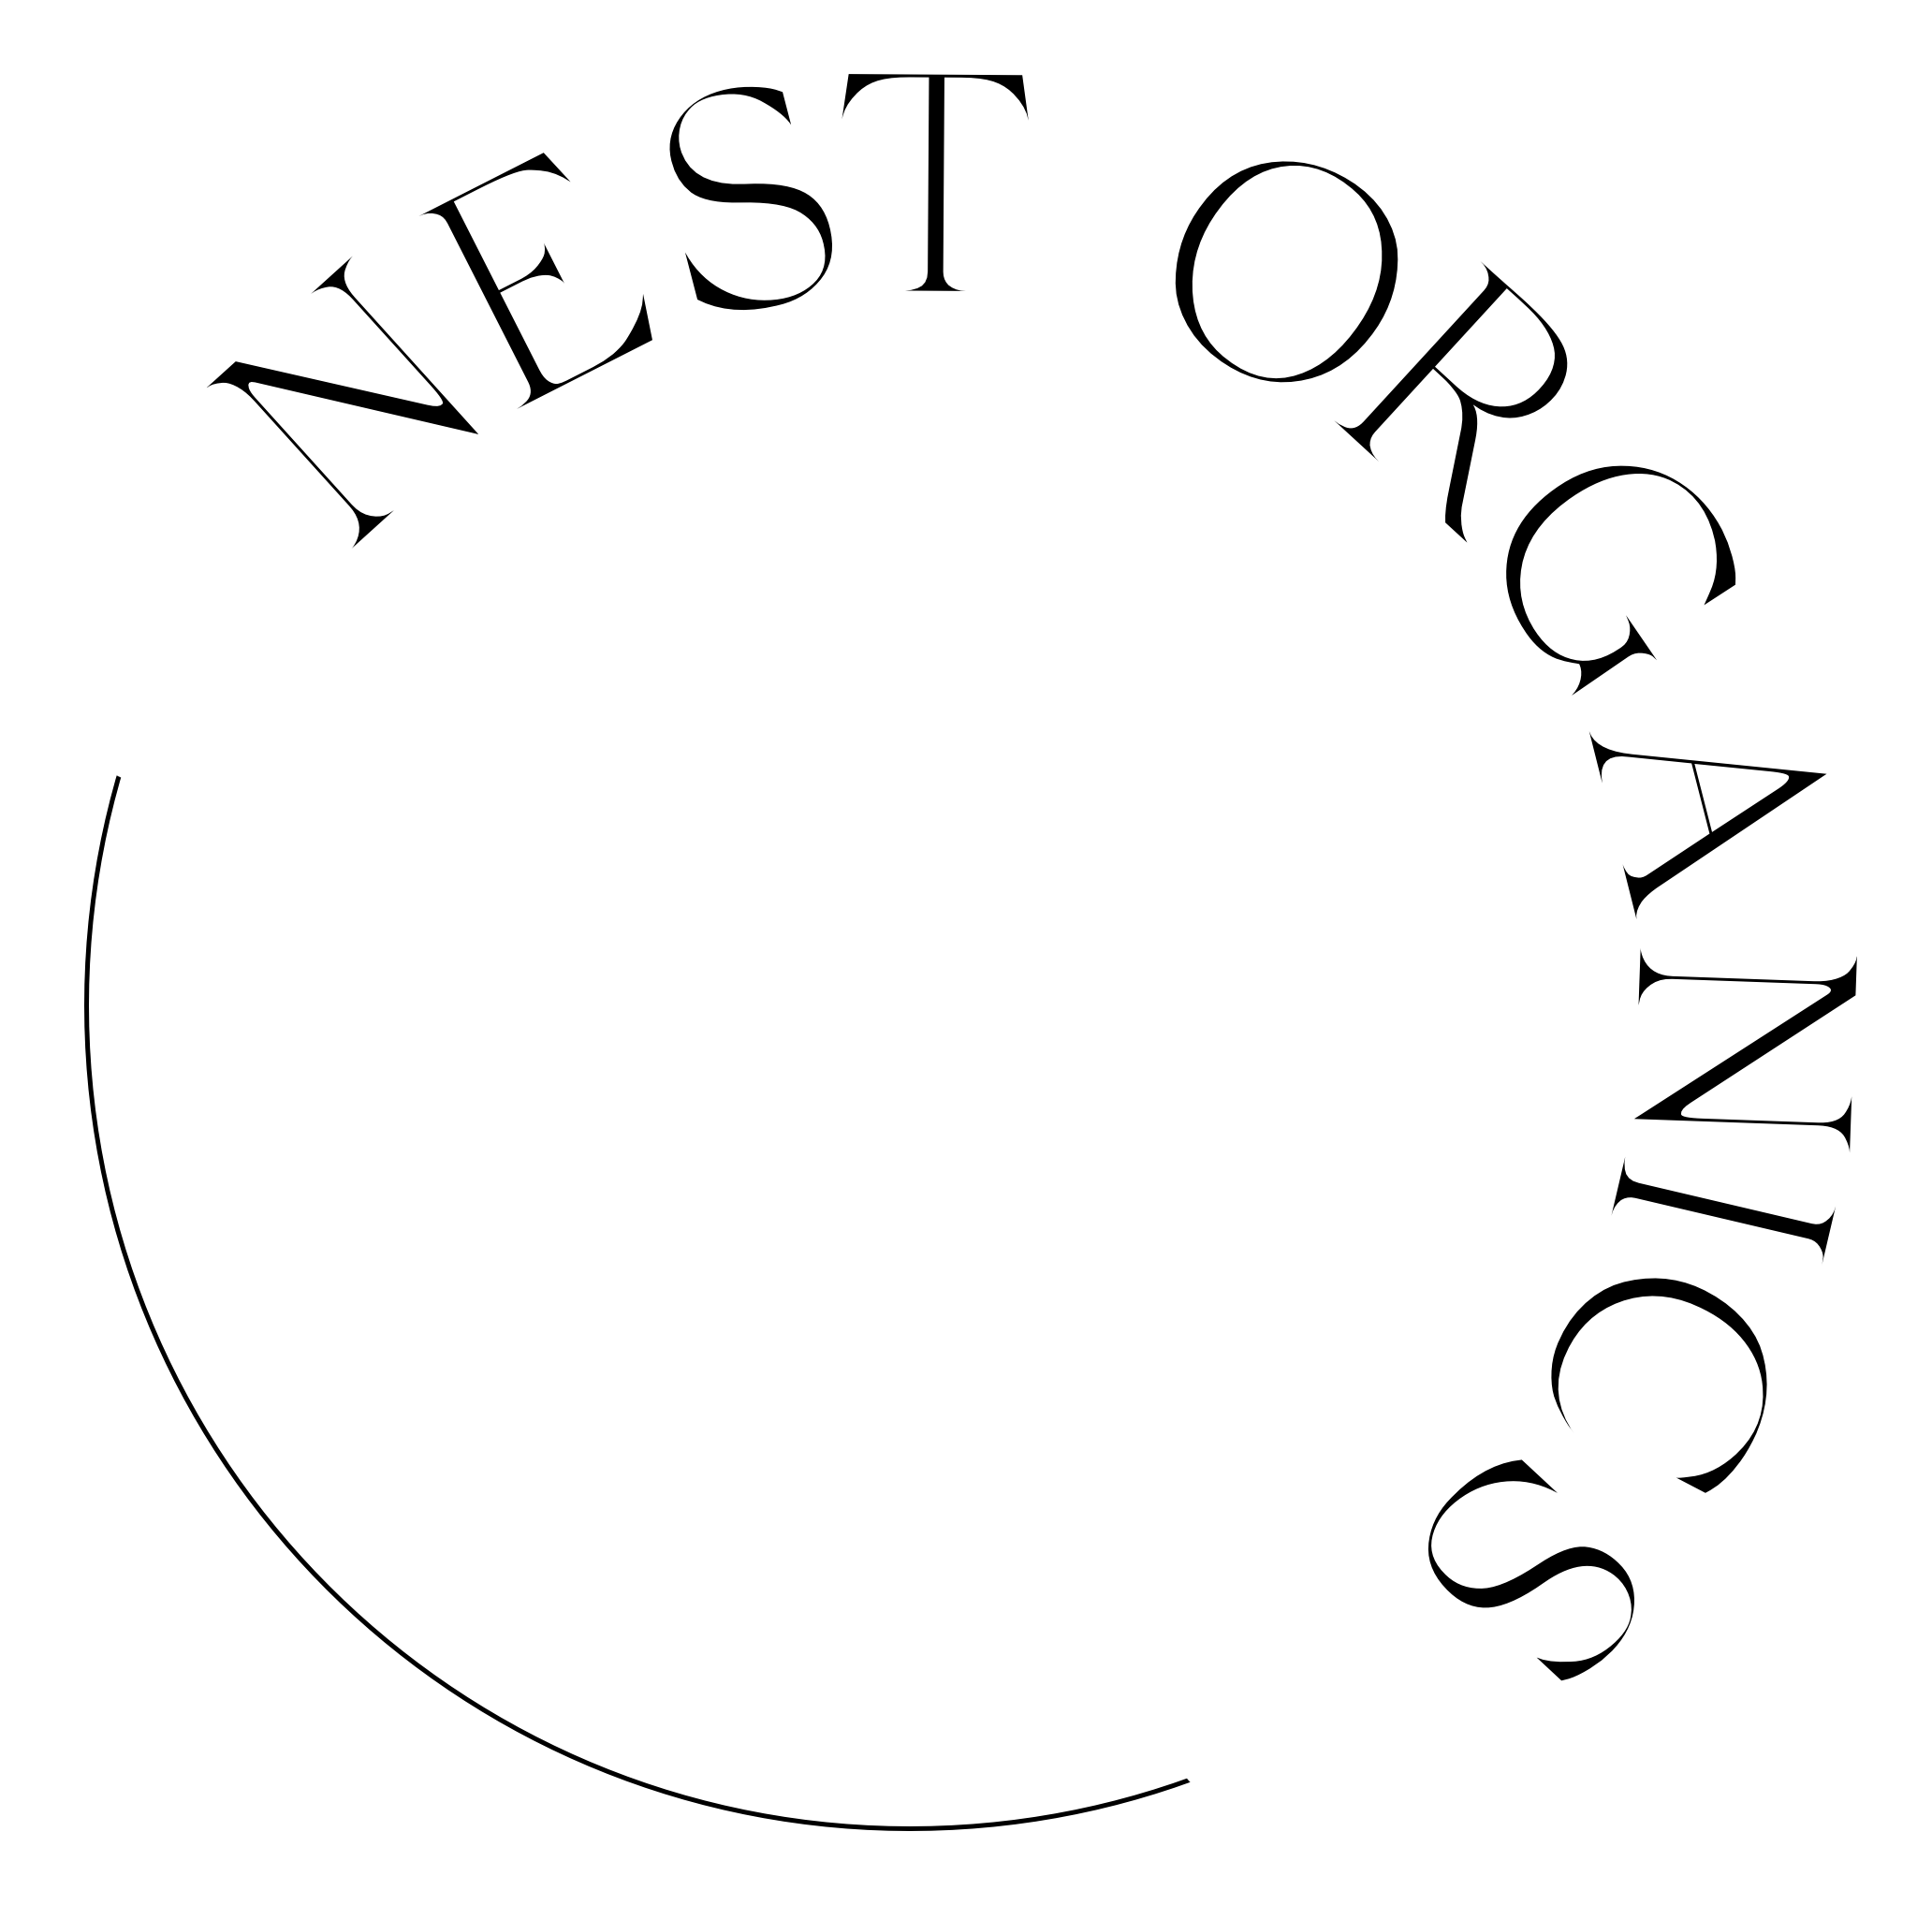 Nest Organics